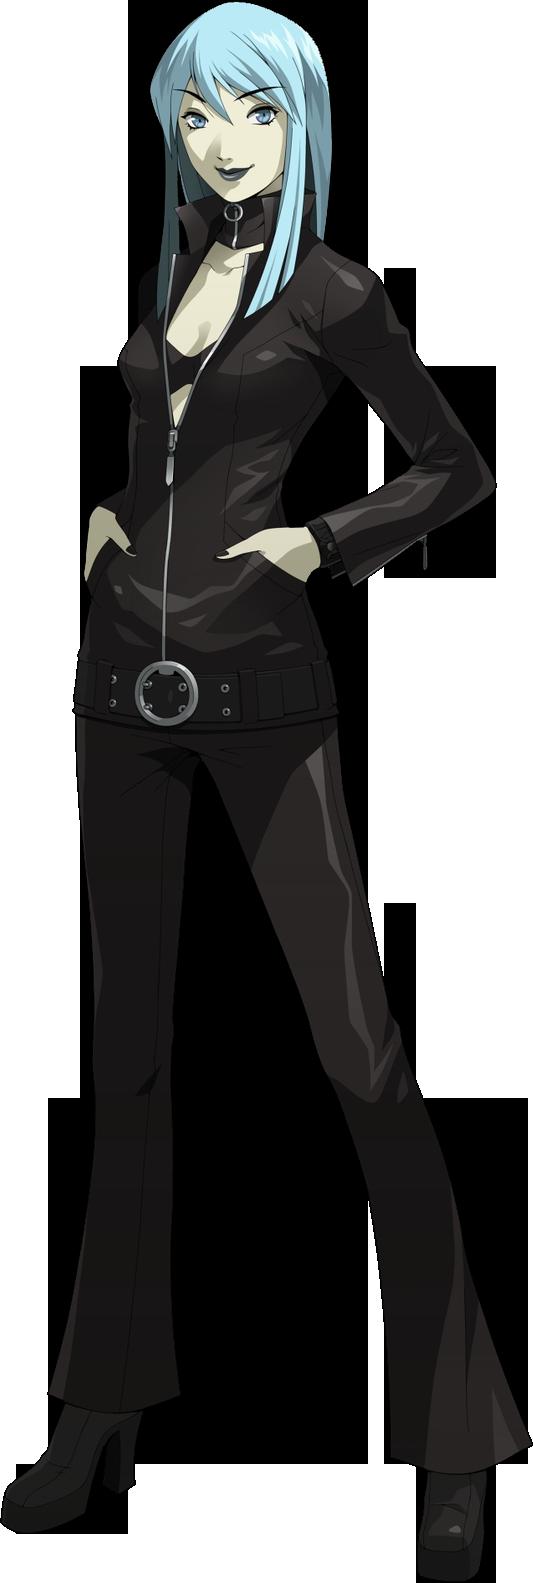 Nemissa Megami Tensei Wiki A Demonic Compendium Of Your